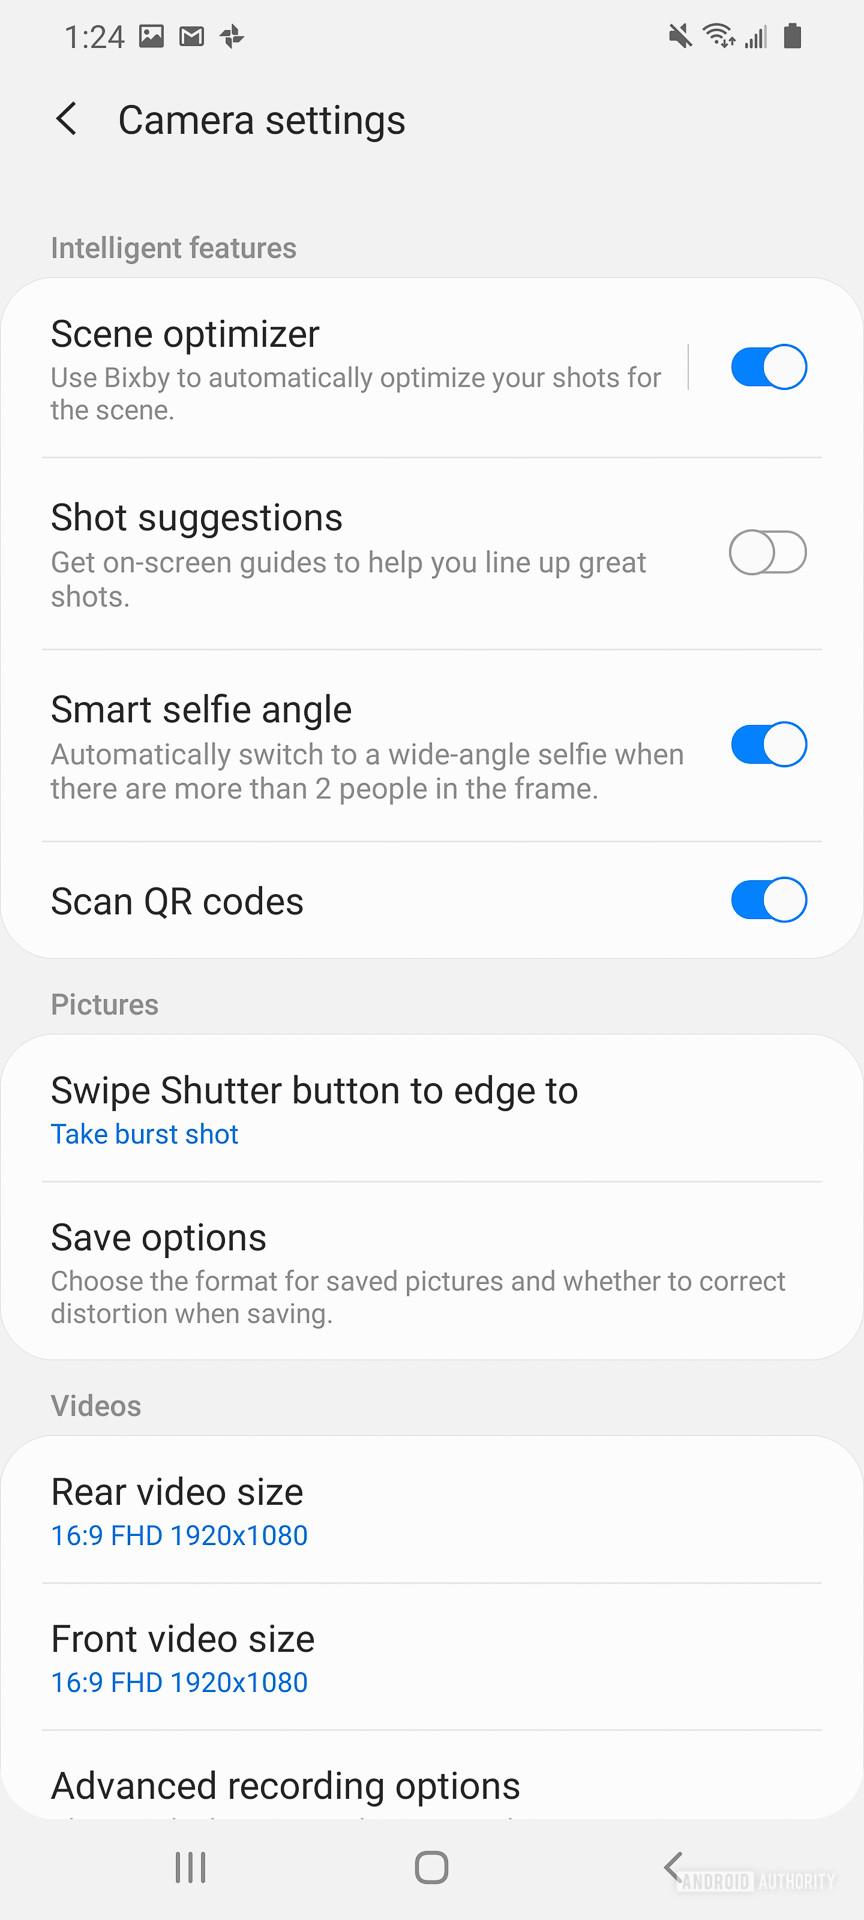 Samsung Galaxy S20 Ultra camera app settings